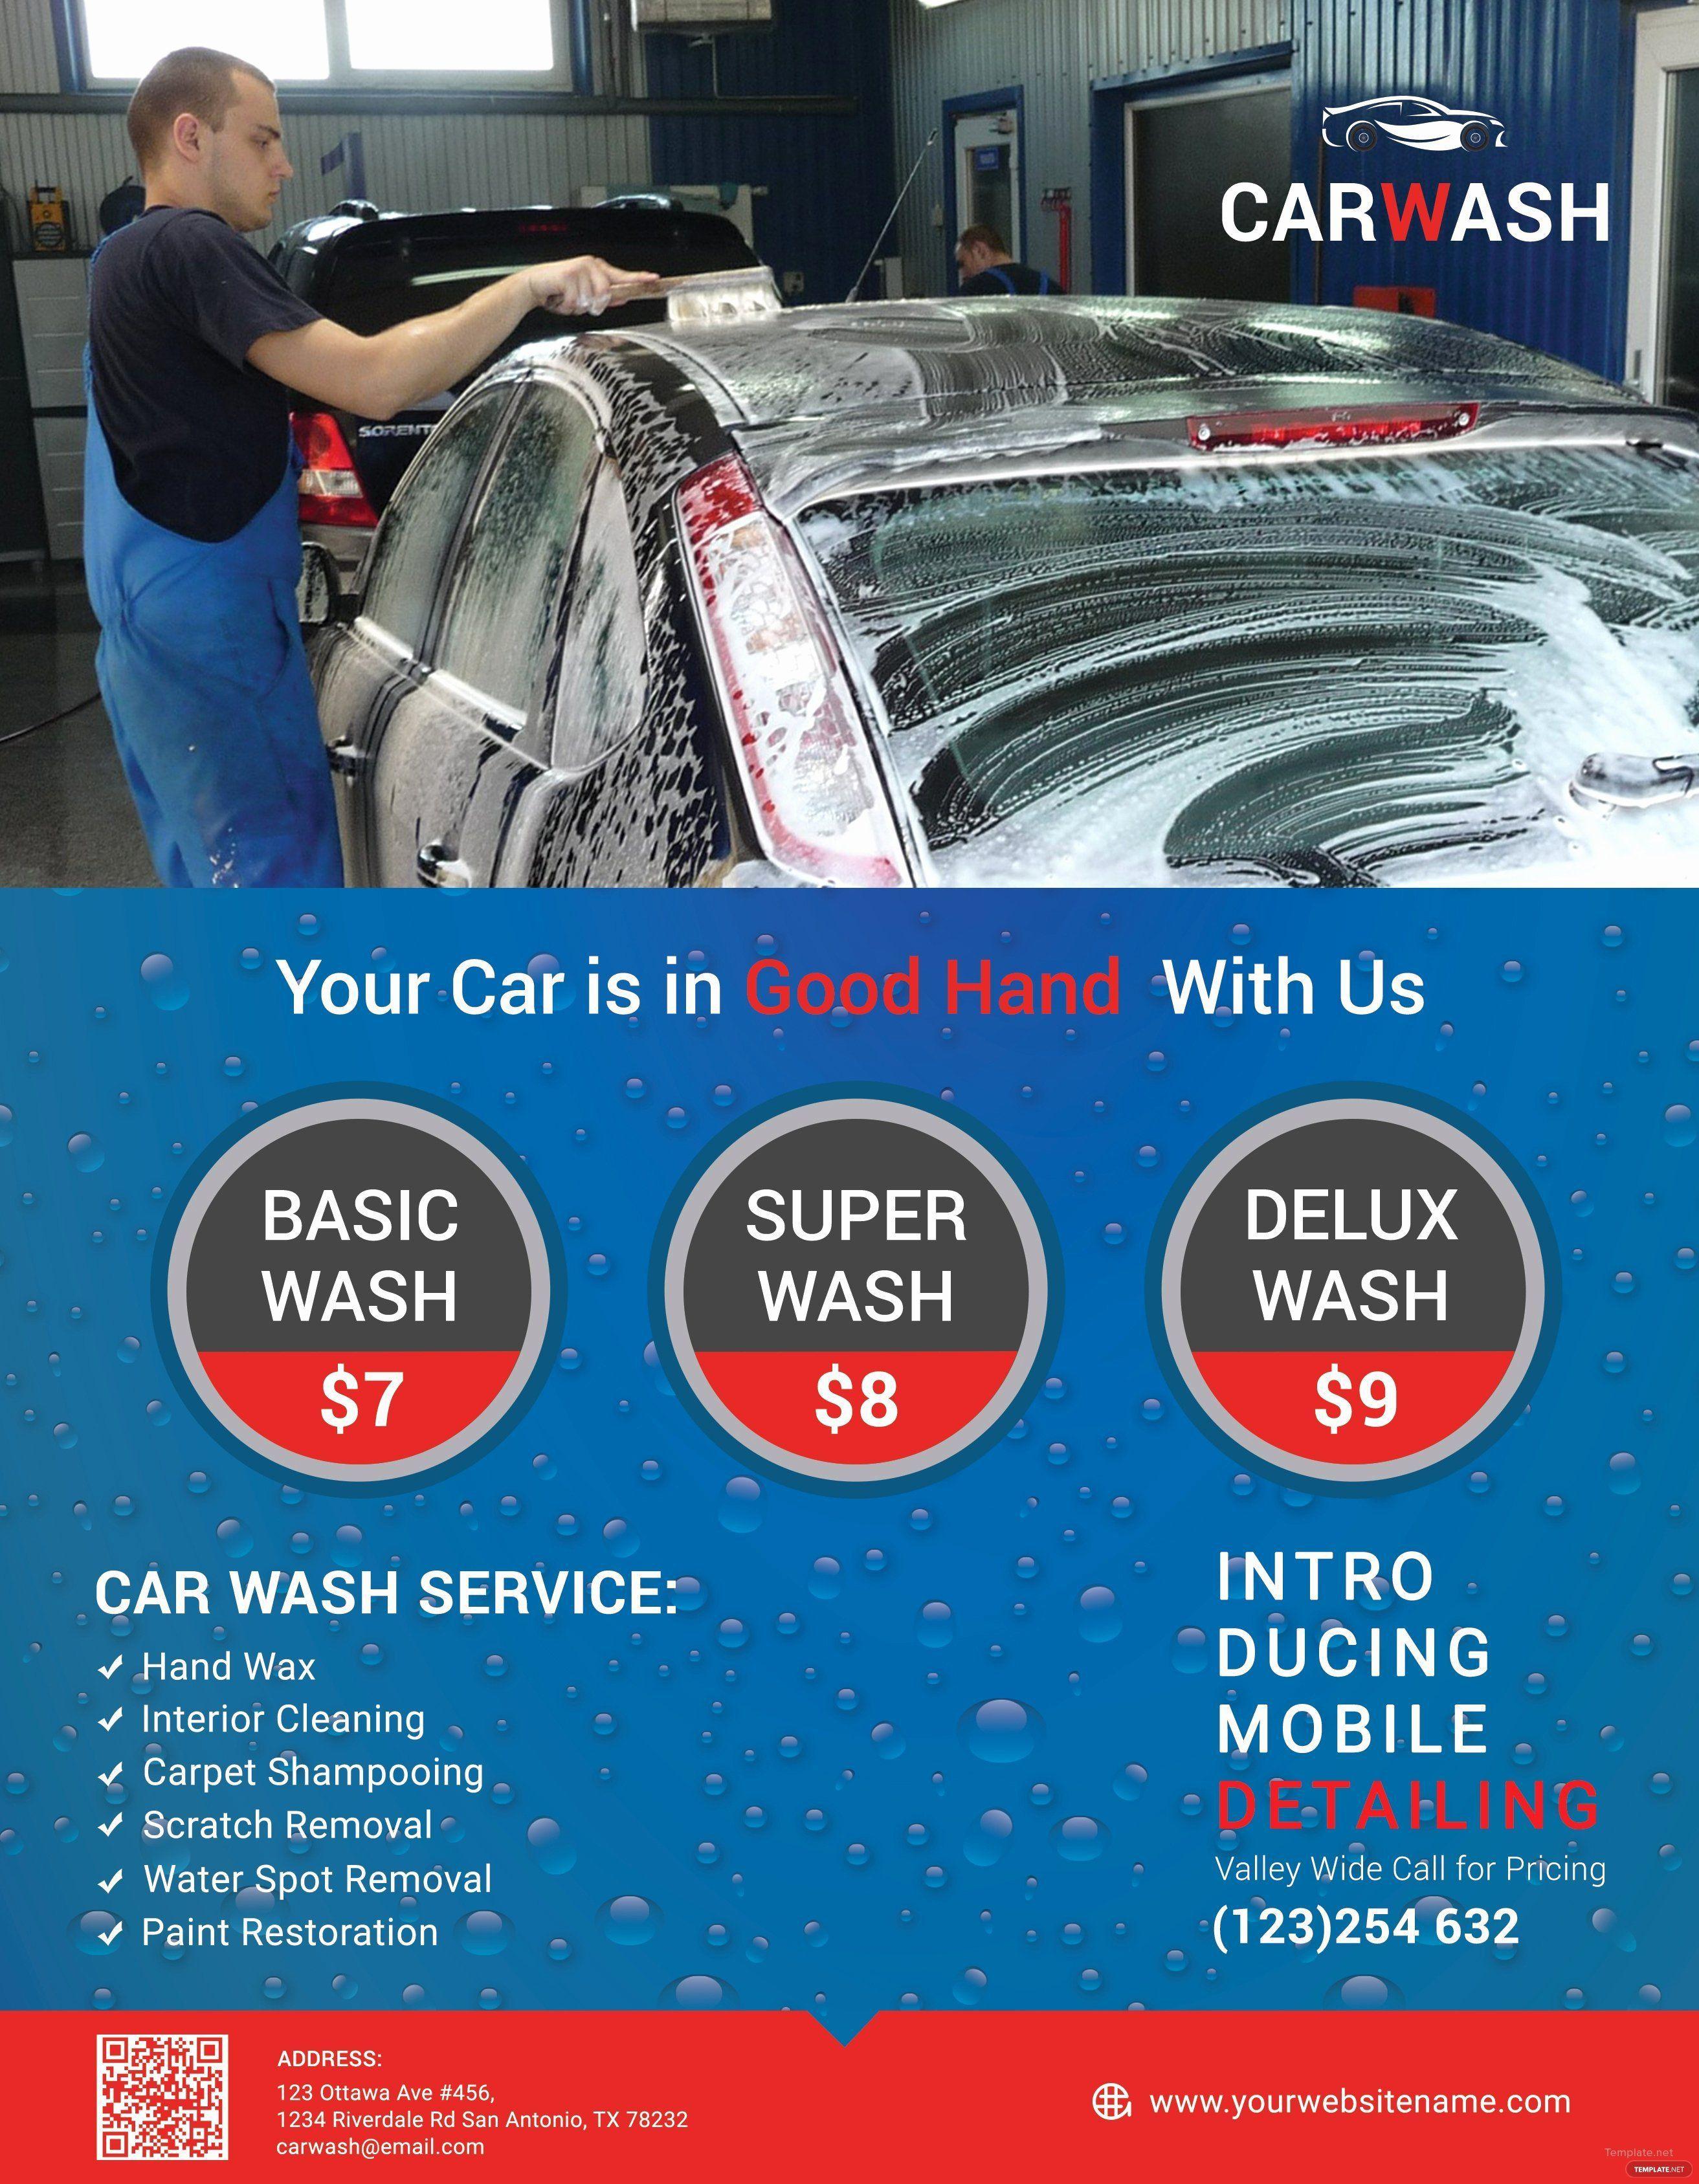 003 Best Car Wash Flyer Template Idea  Free Fundraiser DownloadFull